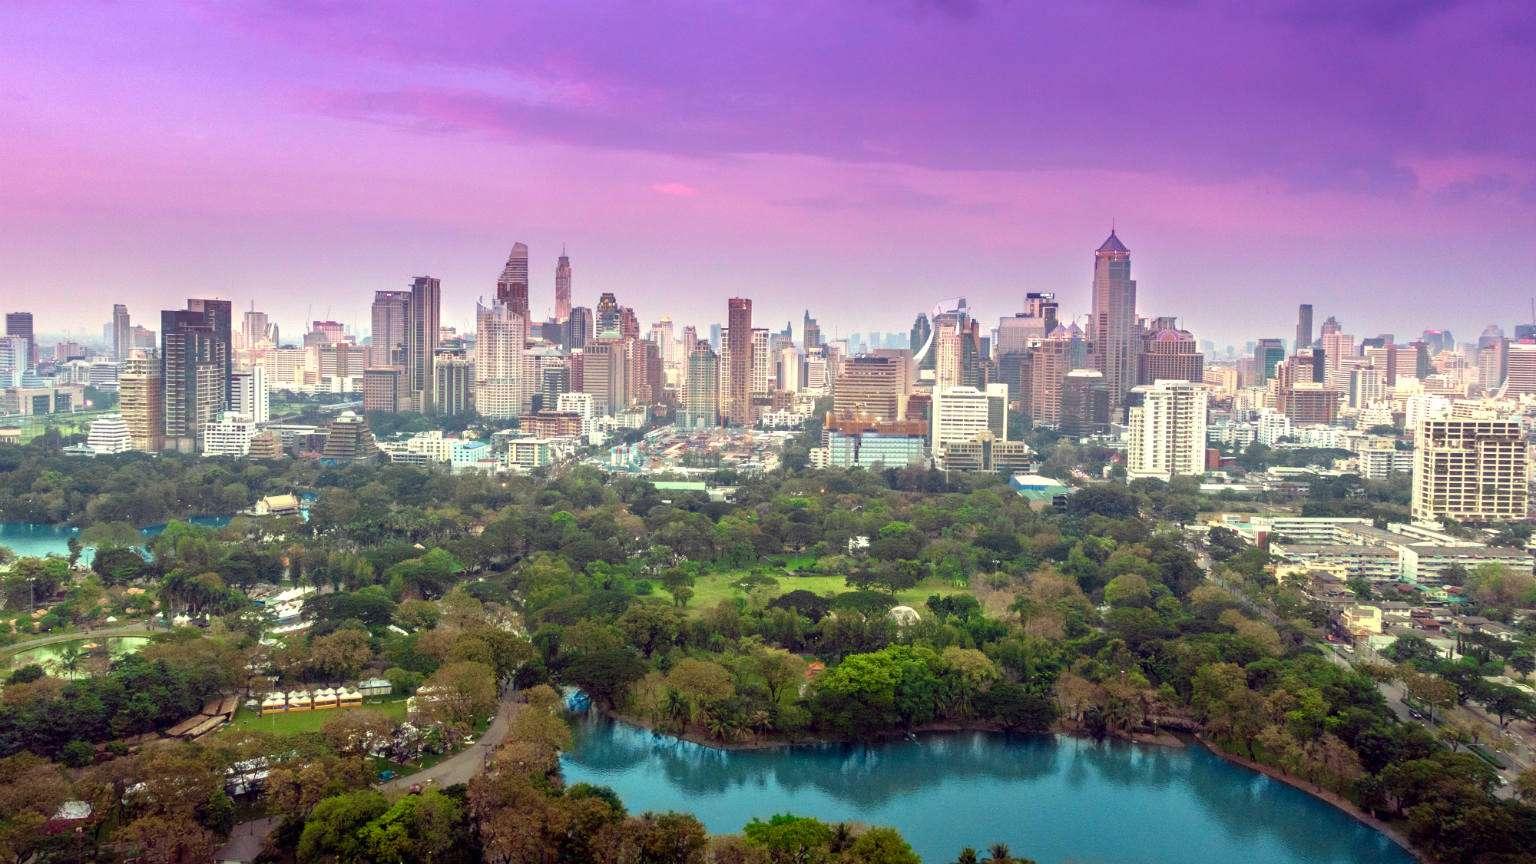 Het Lumphini Park van bovenaf in Bangkok, Thailand